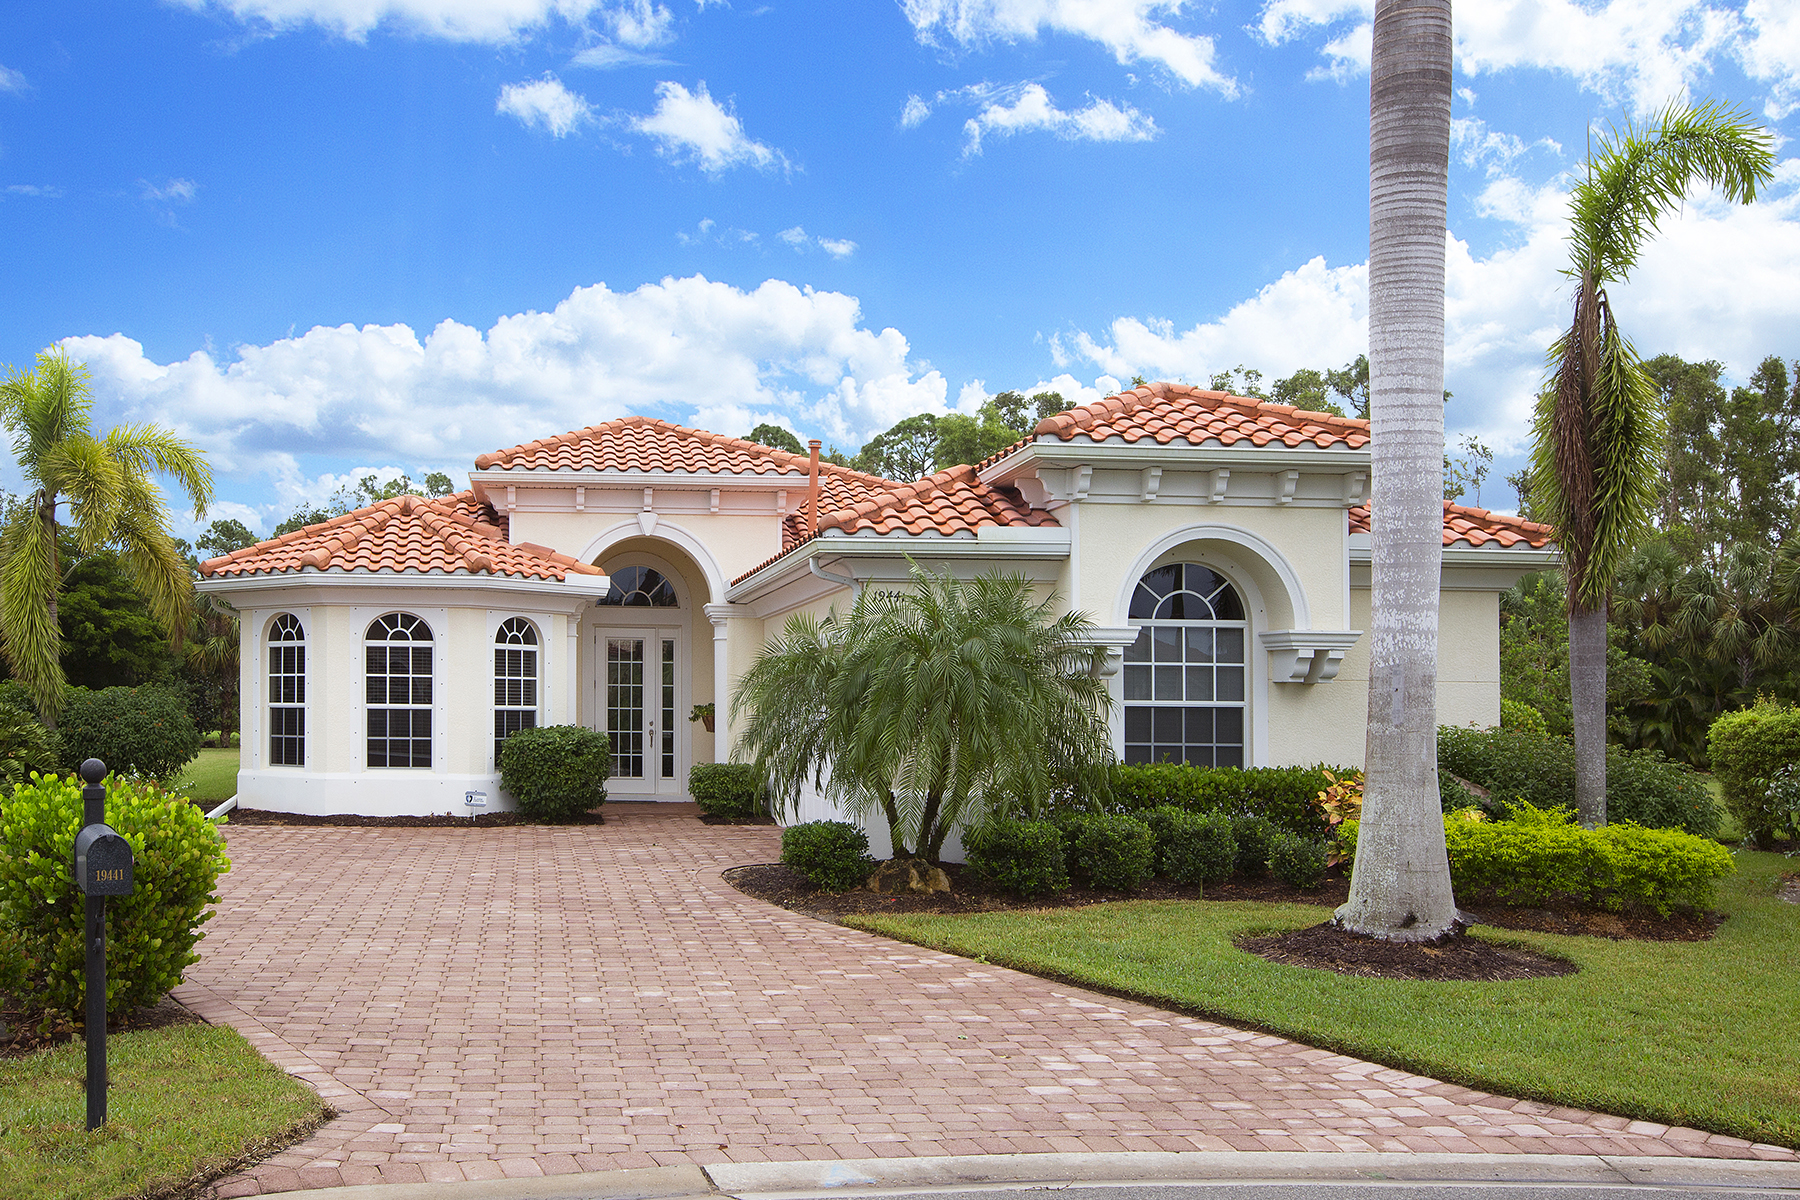 Casa para uma família para Venda às BELLE LAGO 19441 Caladesi Dr Estero, Florida 33967 Estados Unidos